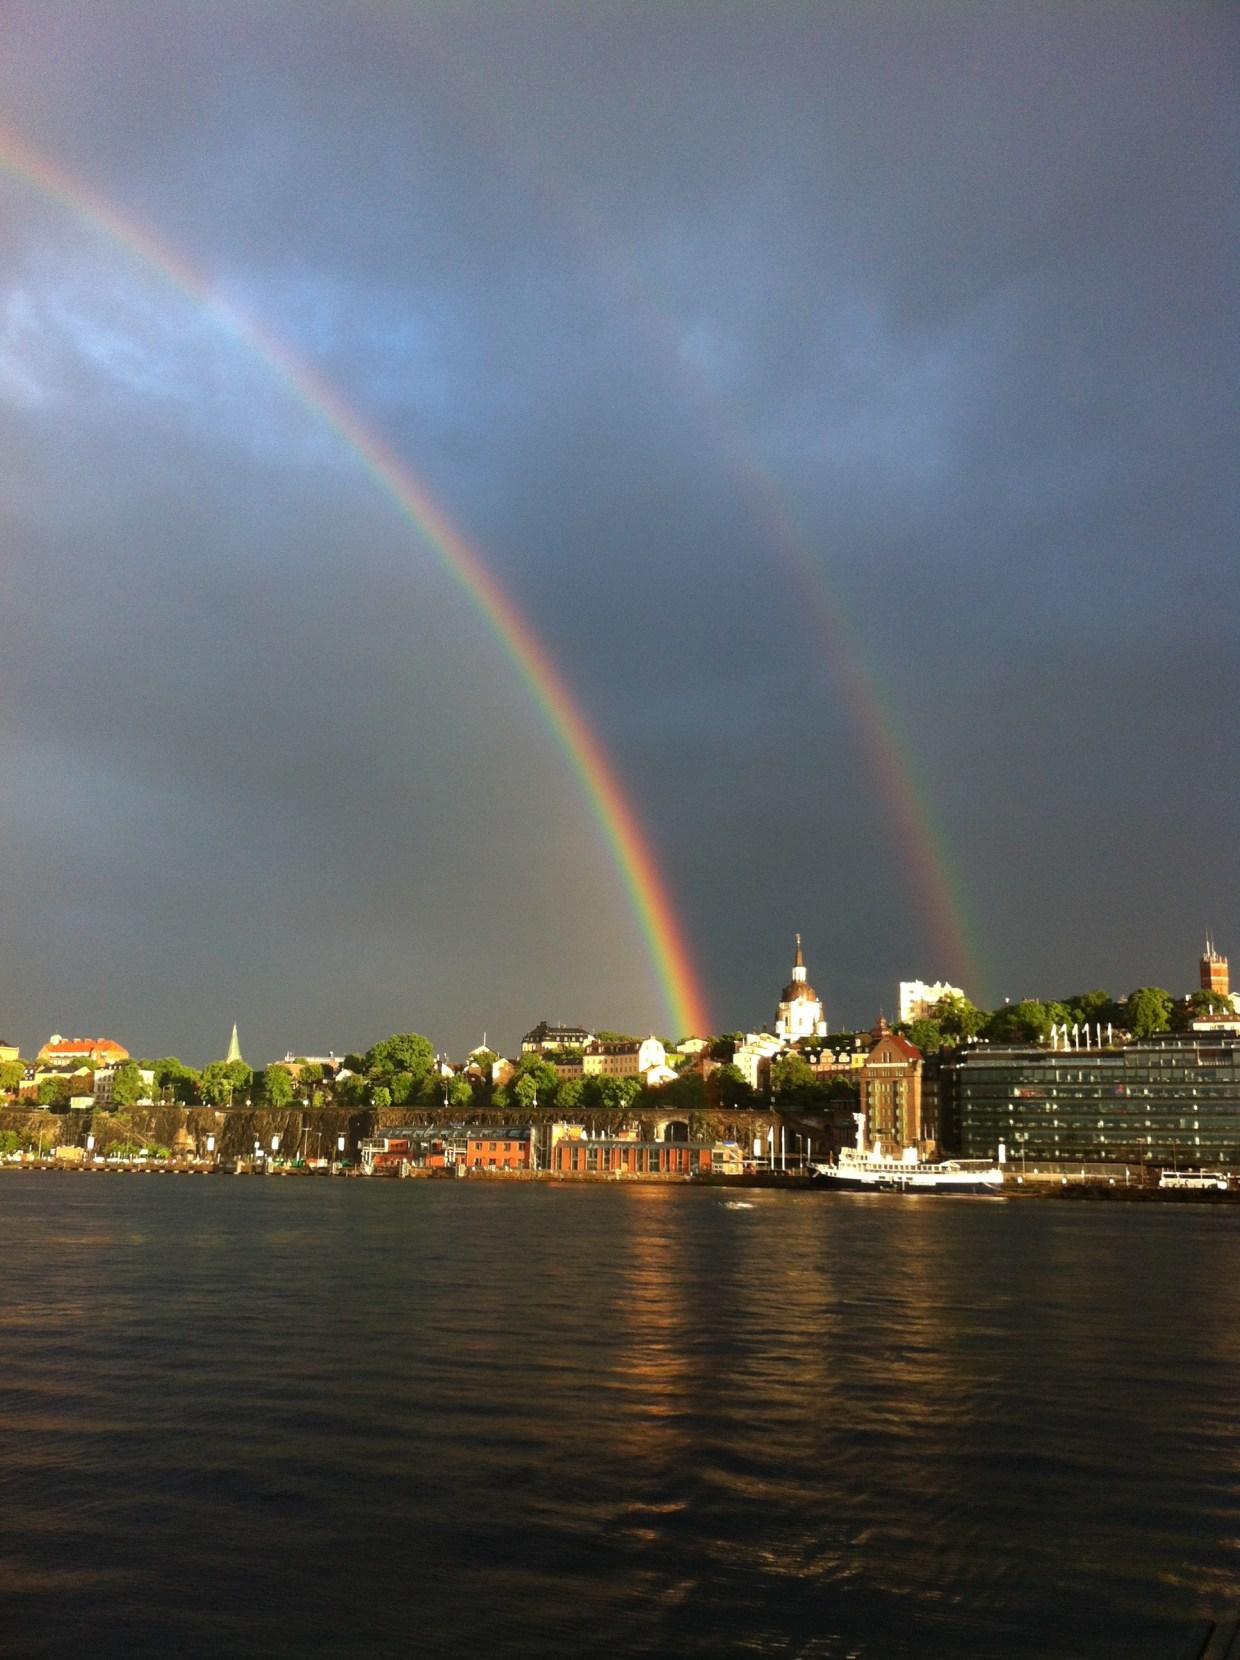 A double rainbow over Saltsjön in Stockholm.